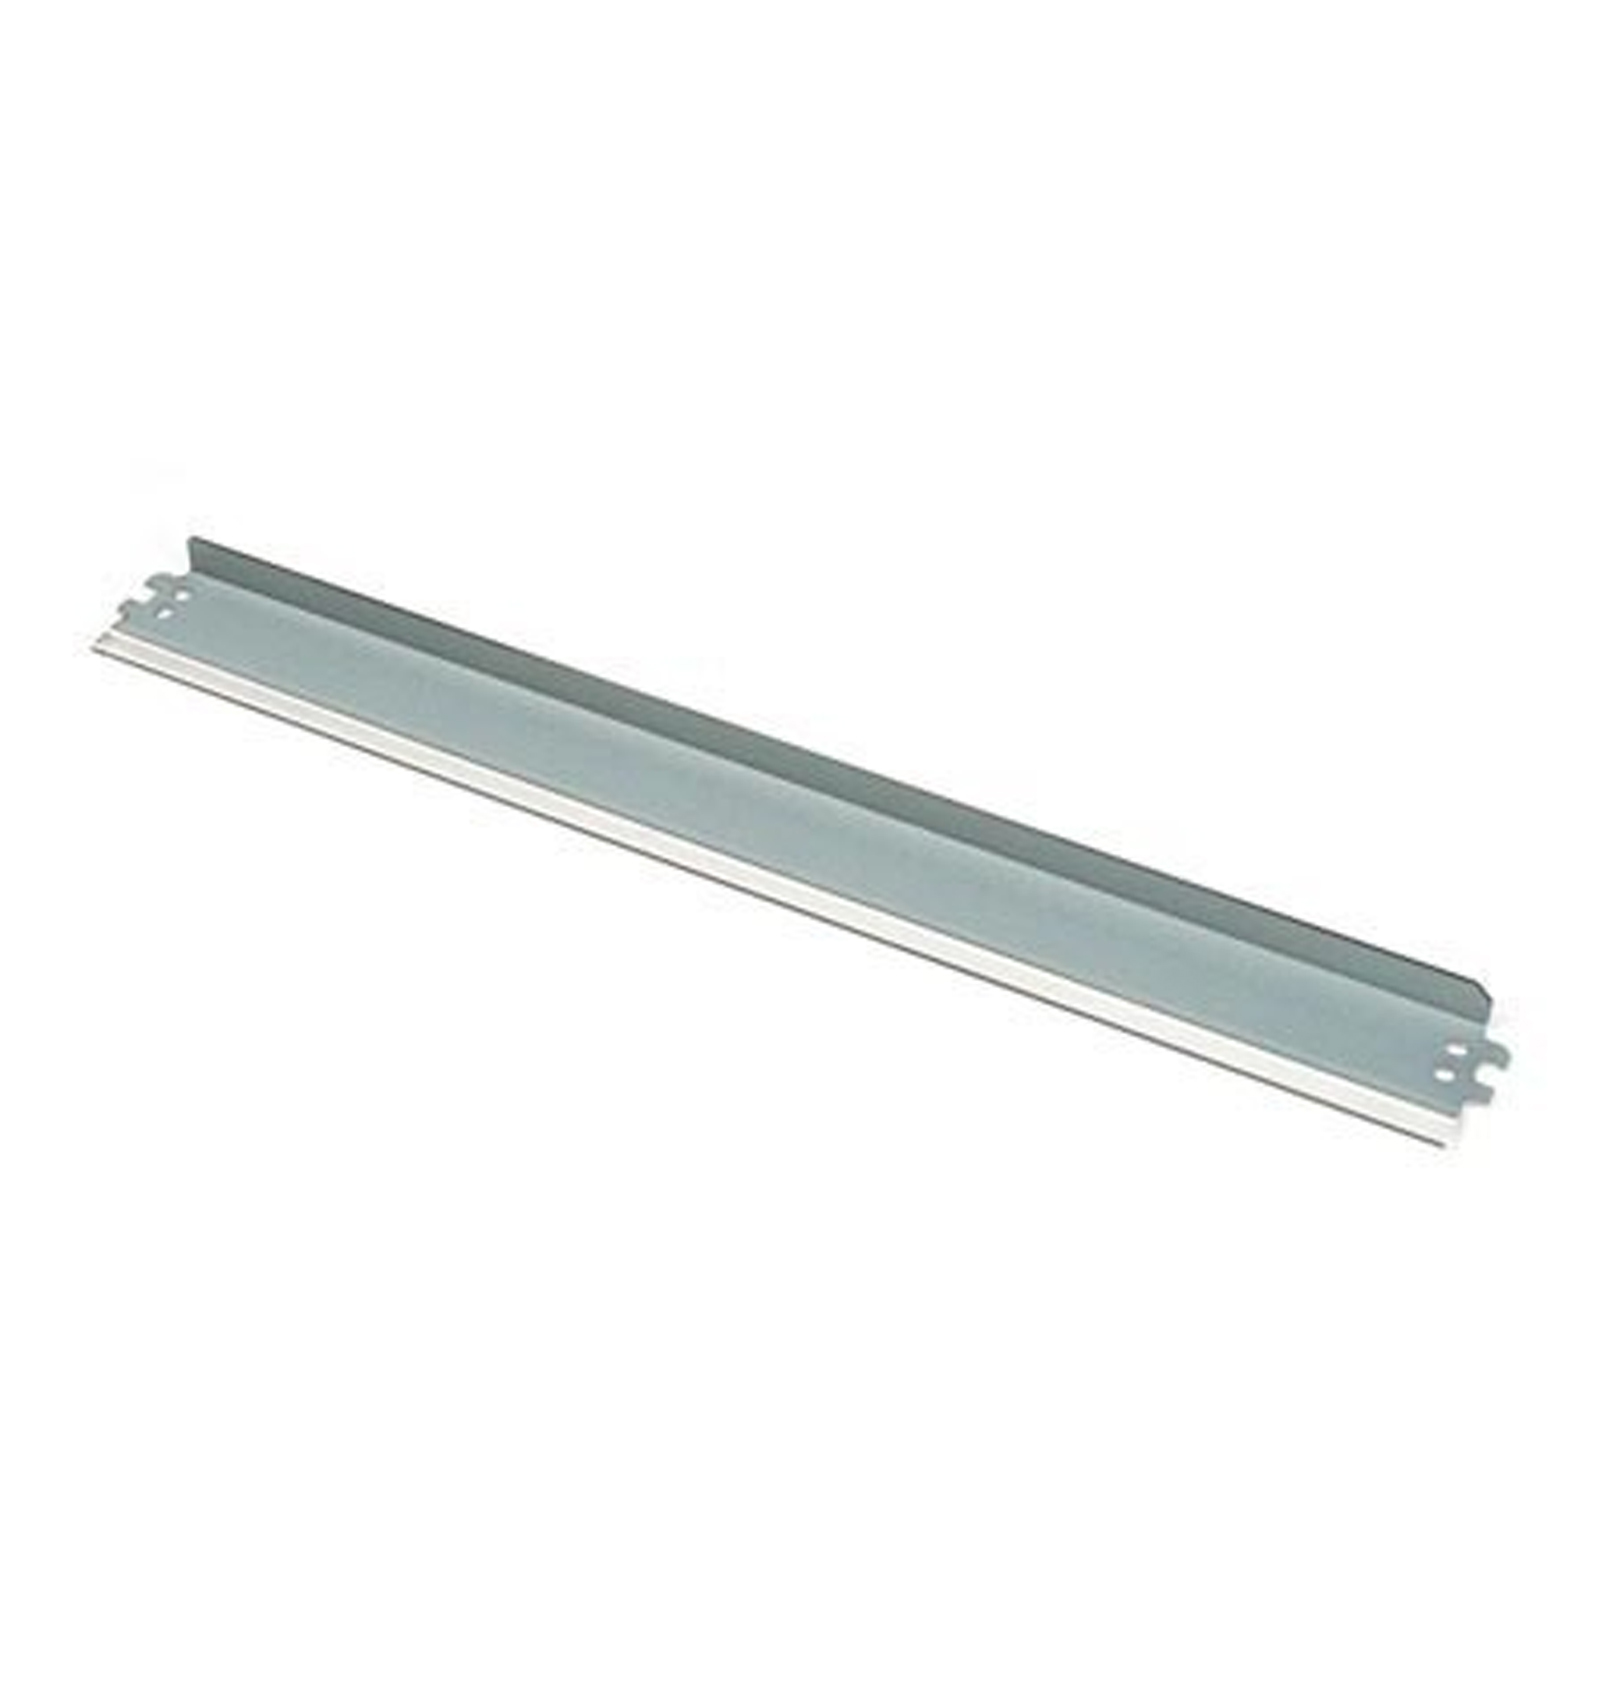 Замена ракеля картриджа HP CB435A (35A) для LaserJet P1005/P1006/P1007/P1008